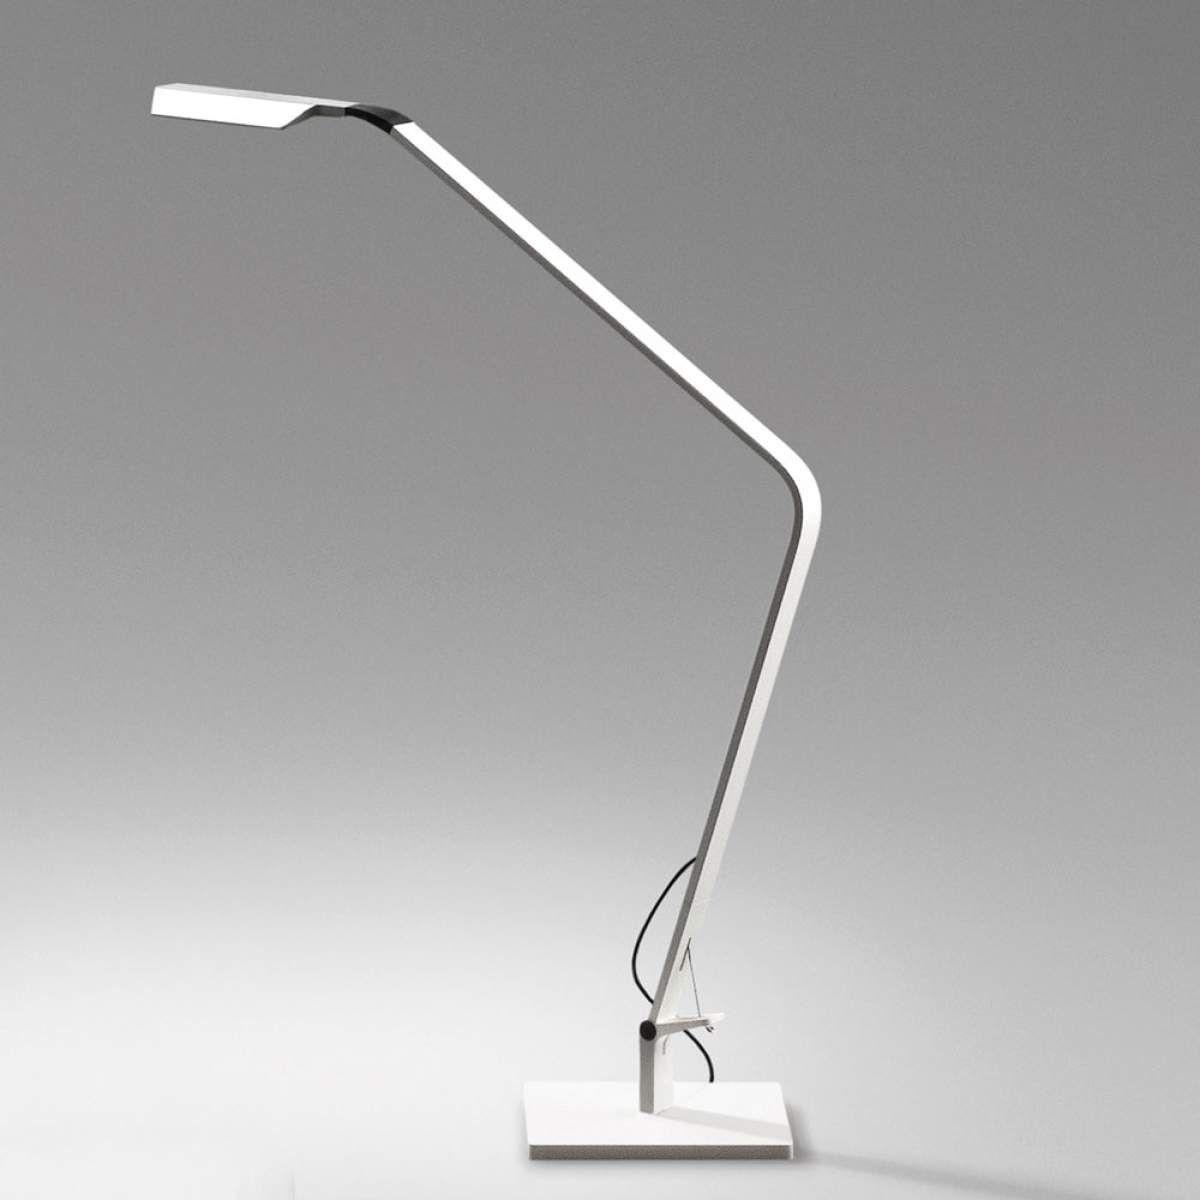 Nachttischlampe Schirm Moderne Leuchten Lampe Led Dimmbar